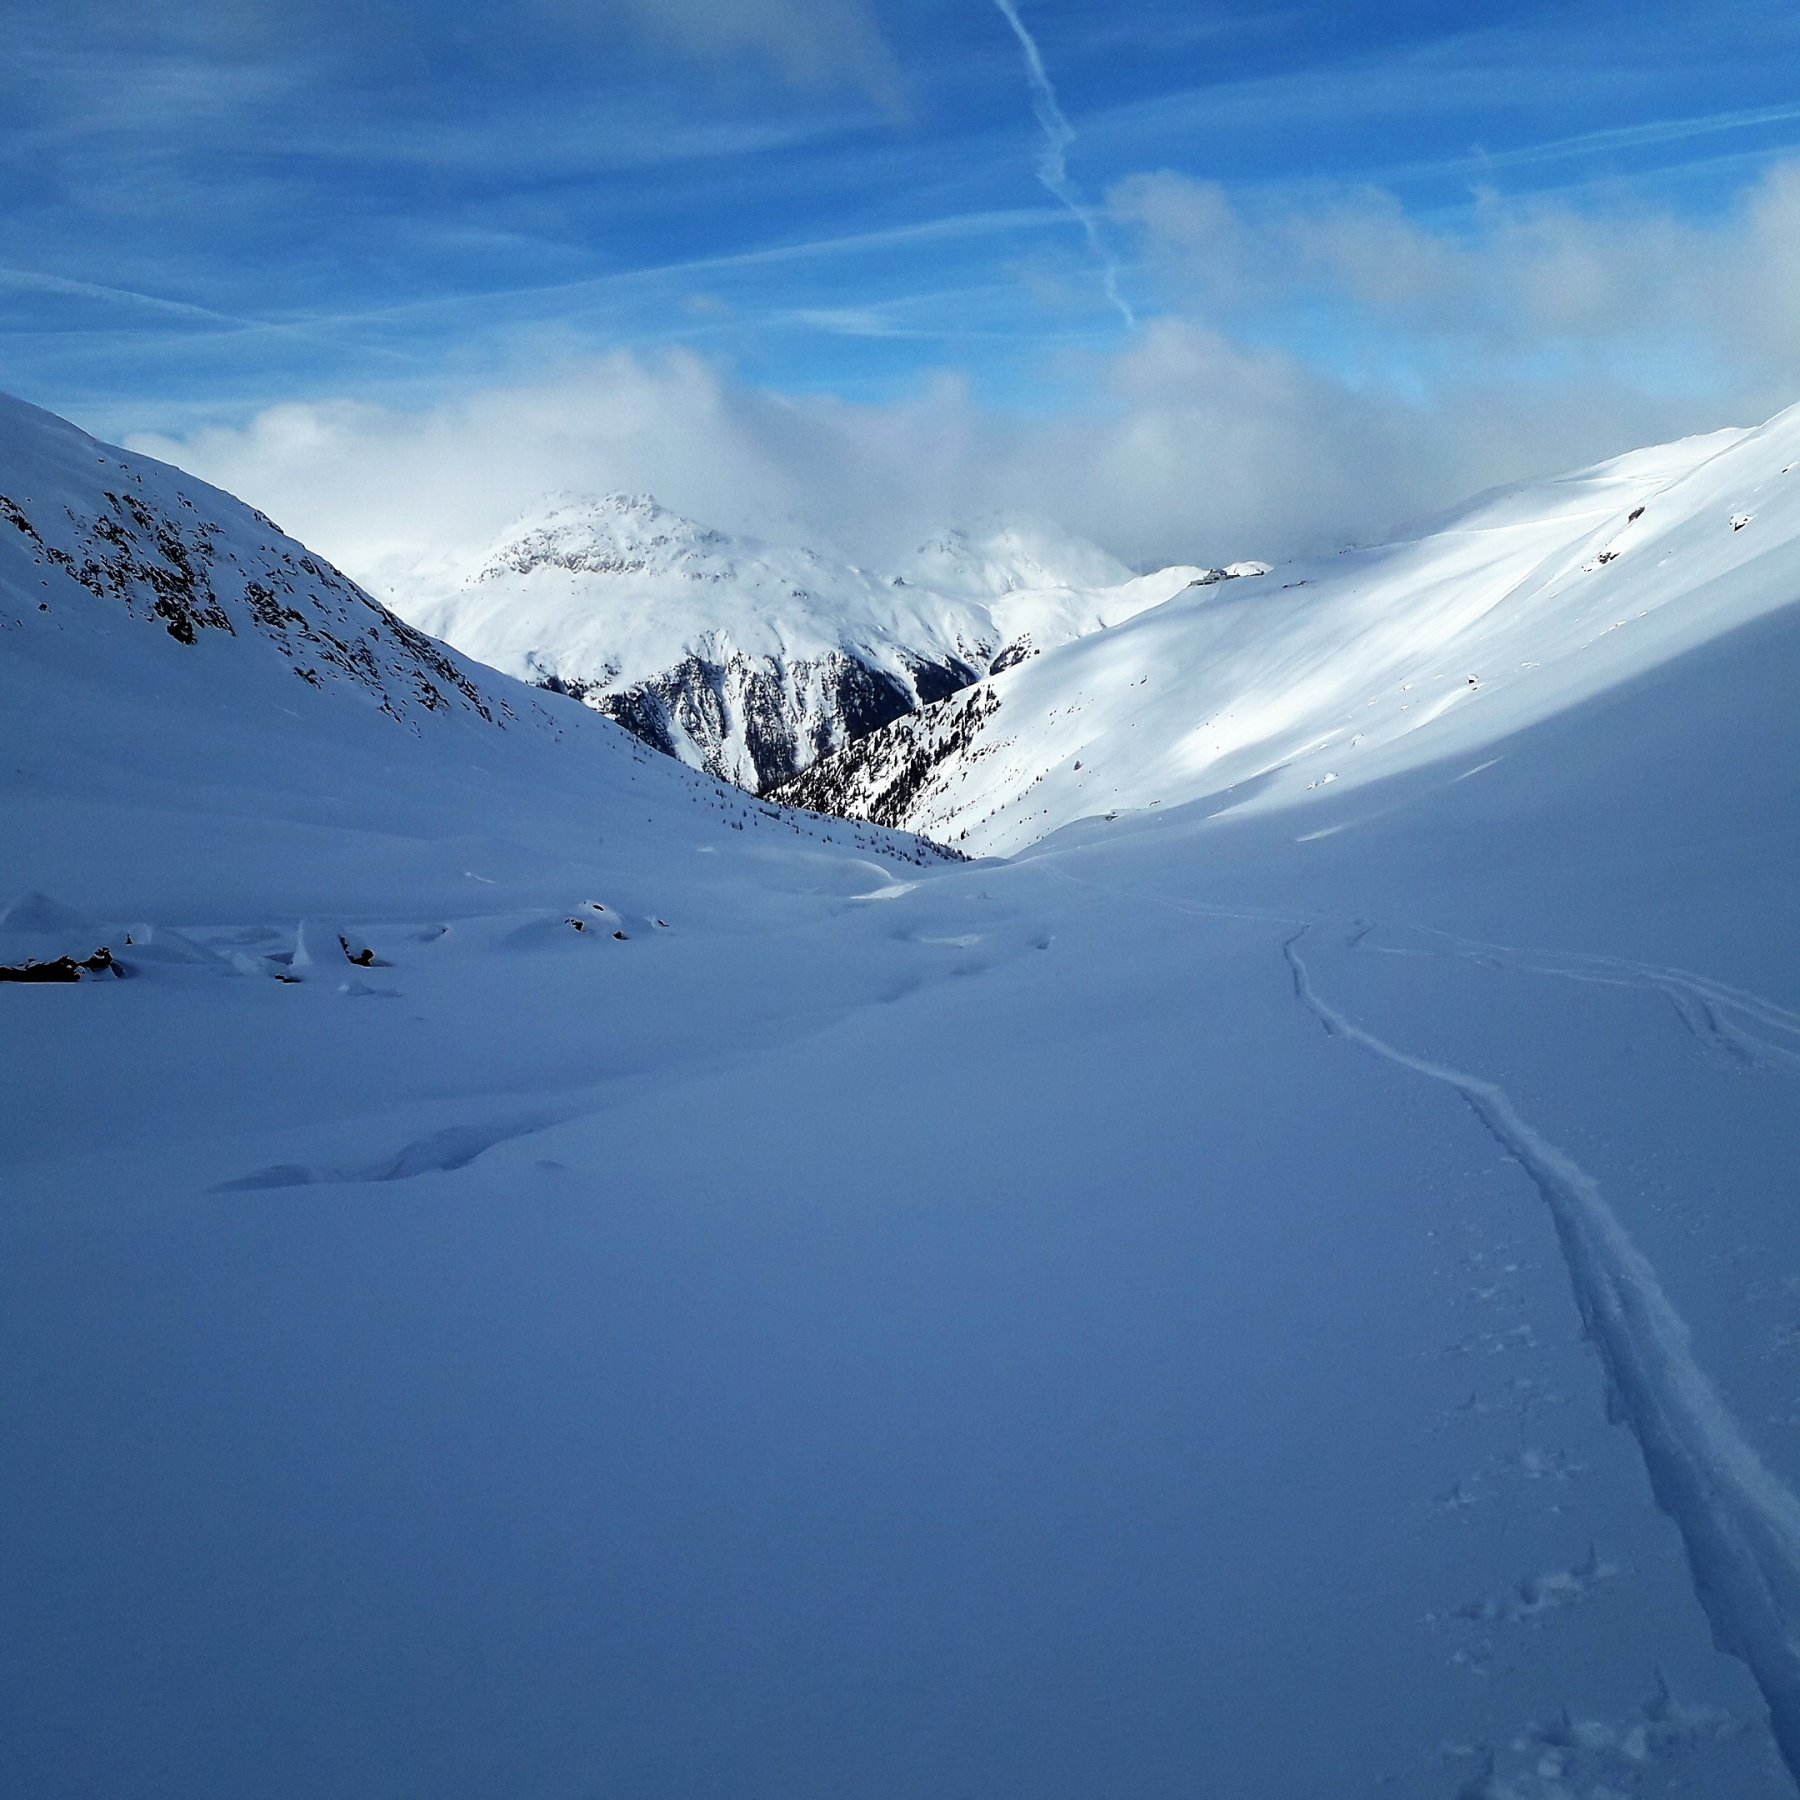 Verso valle